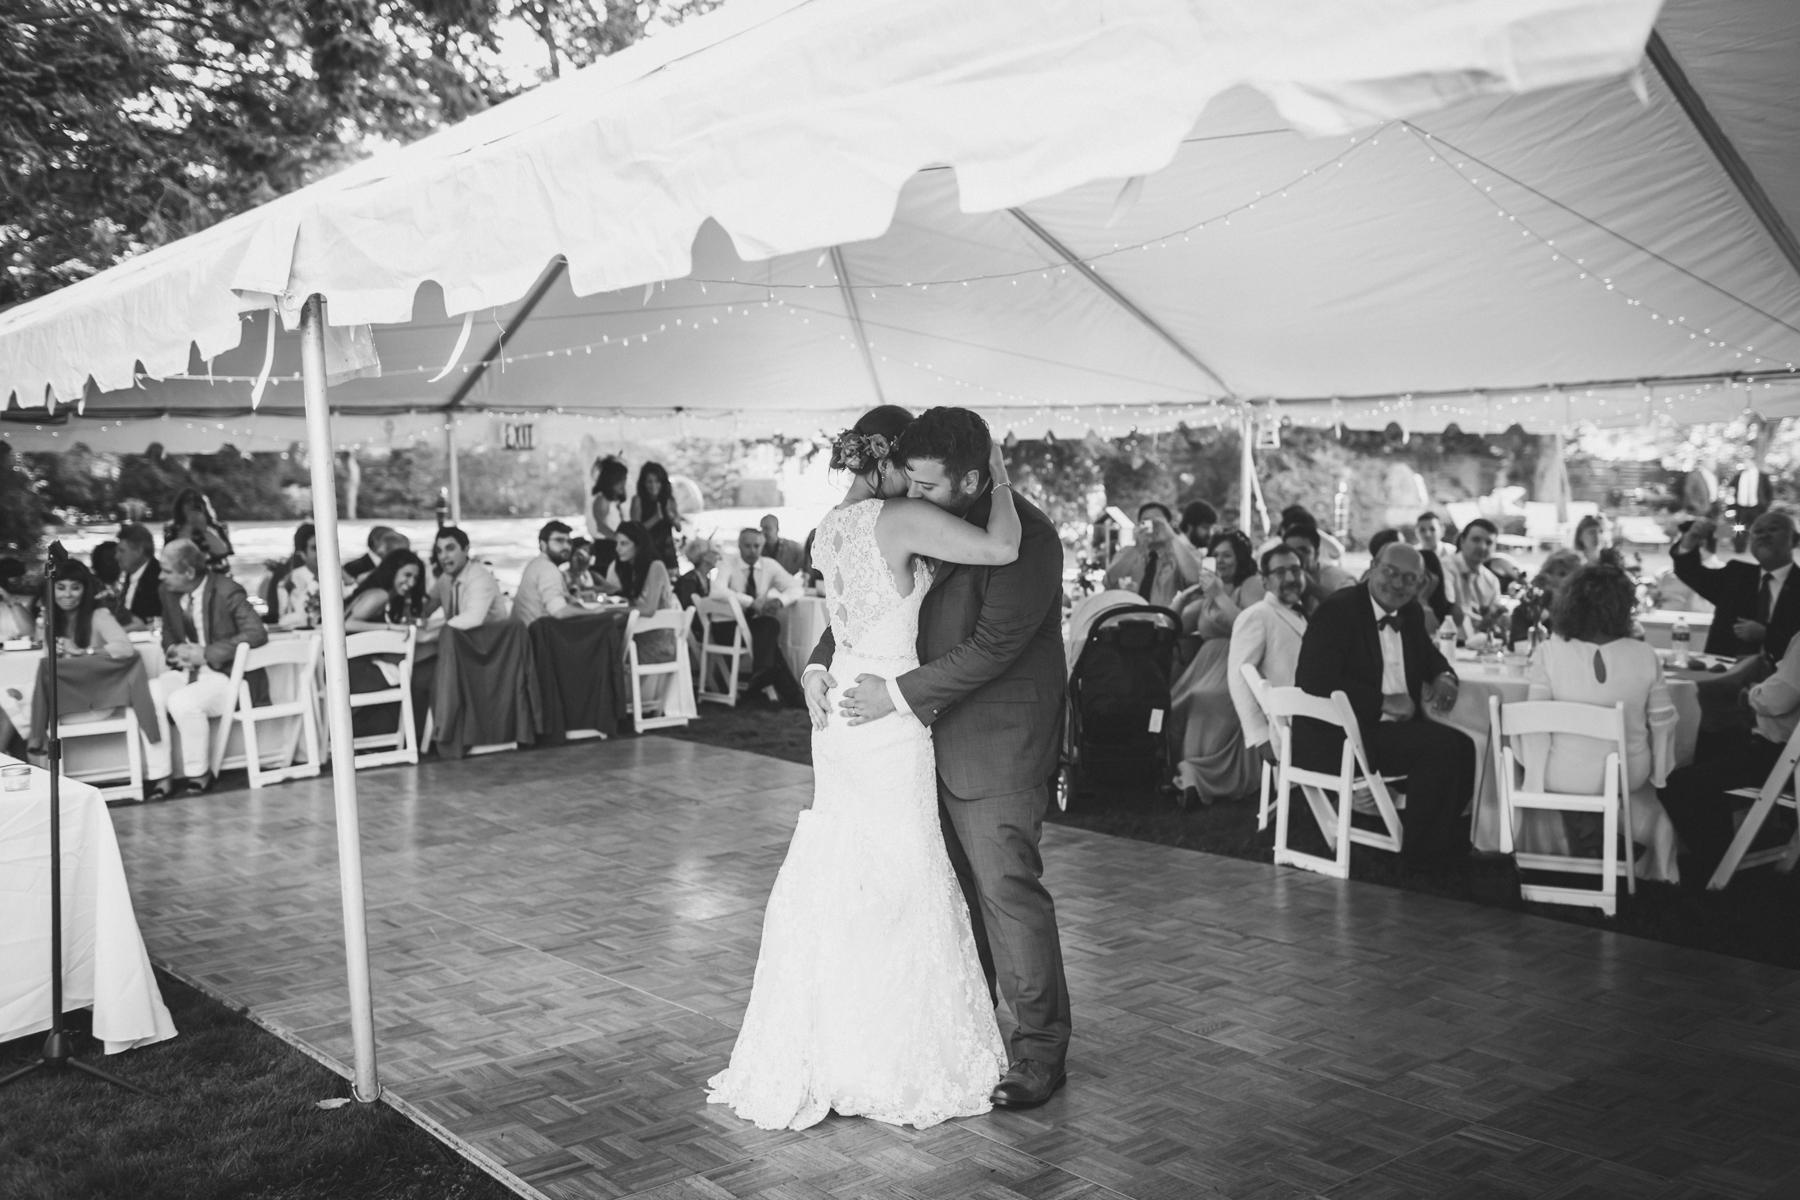 Long-Island-Documentary-Wedding-Photography-Summer-Tent-Wedding-in-New-York-105.jpg